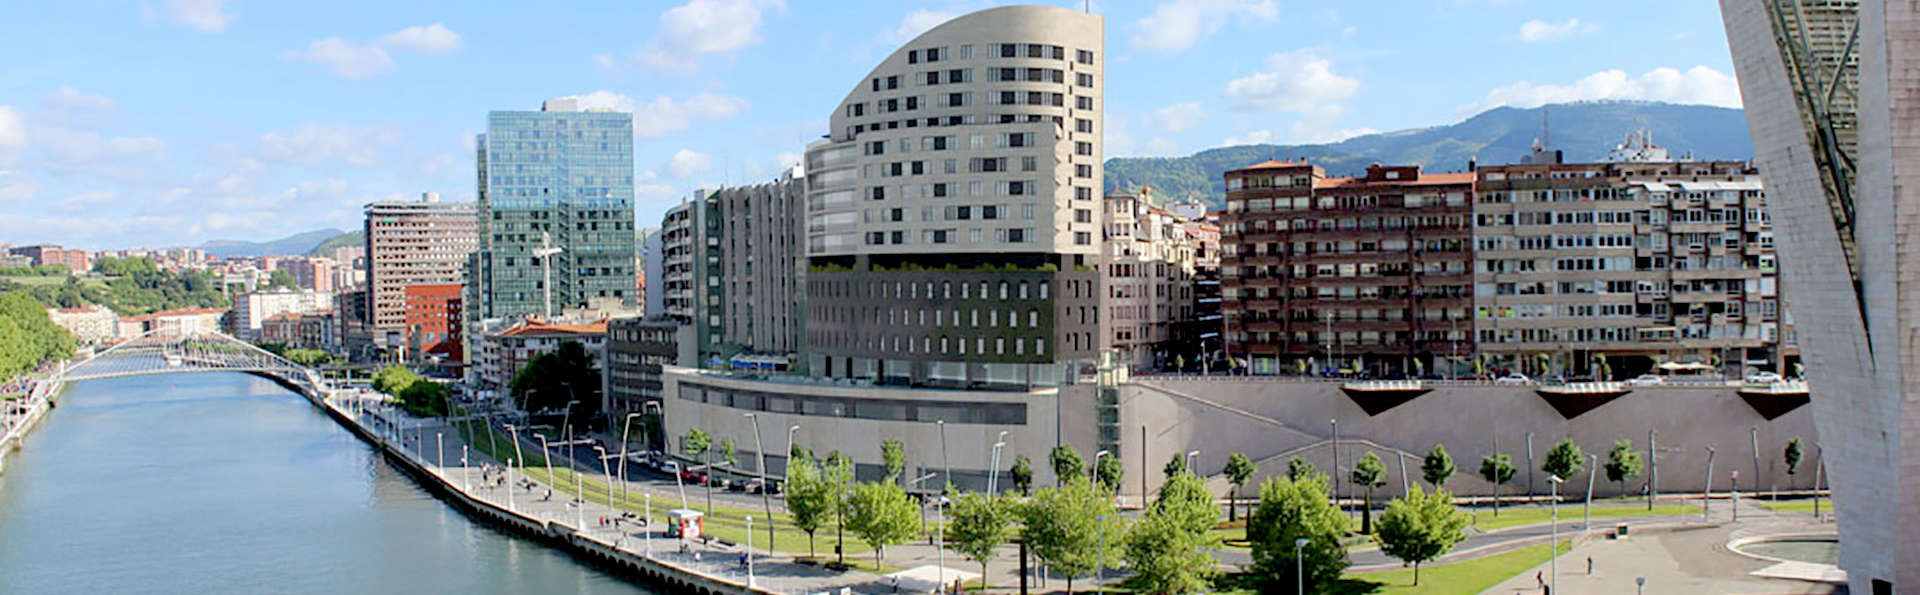 Hotel Gran Bilbao - Edit_Destination7.jpg